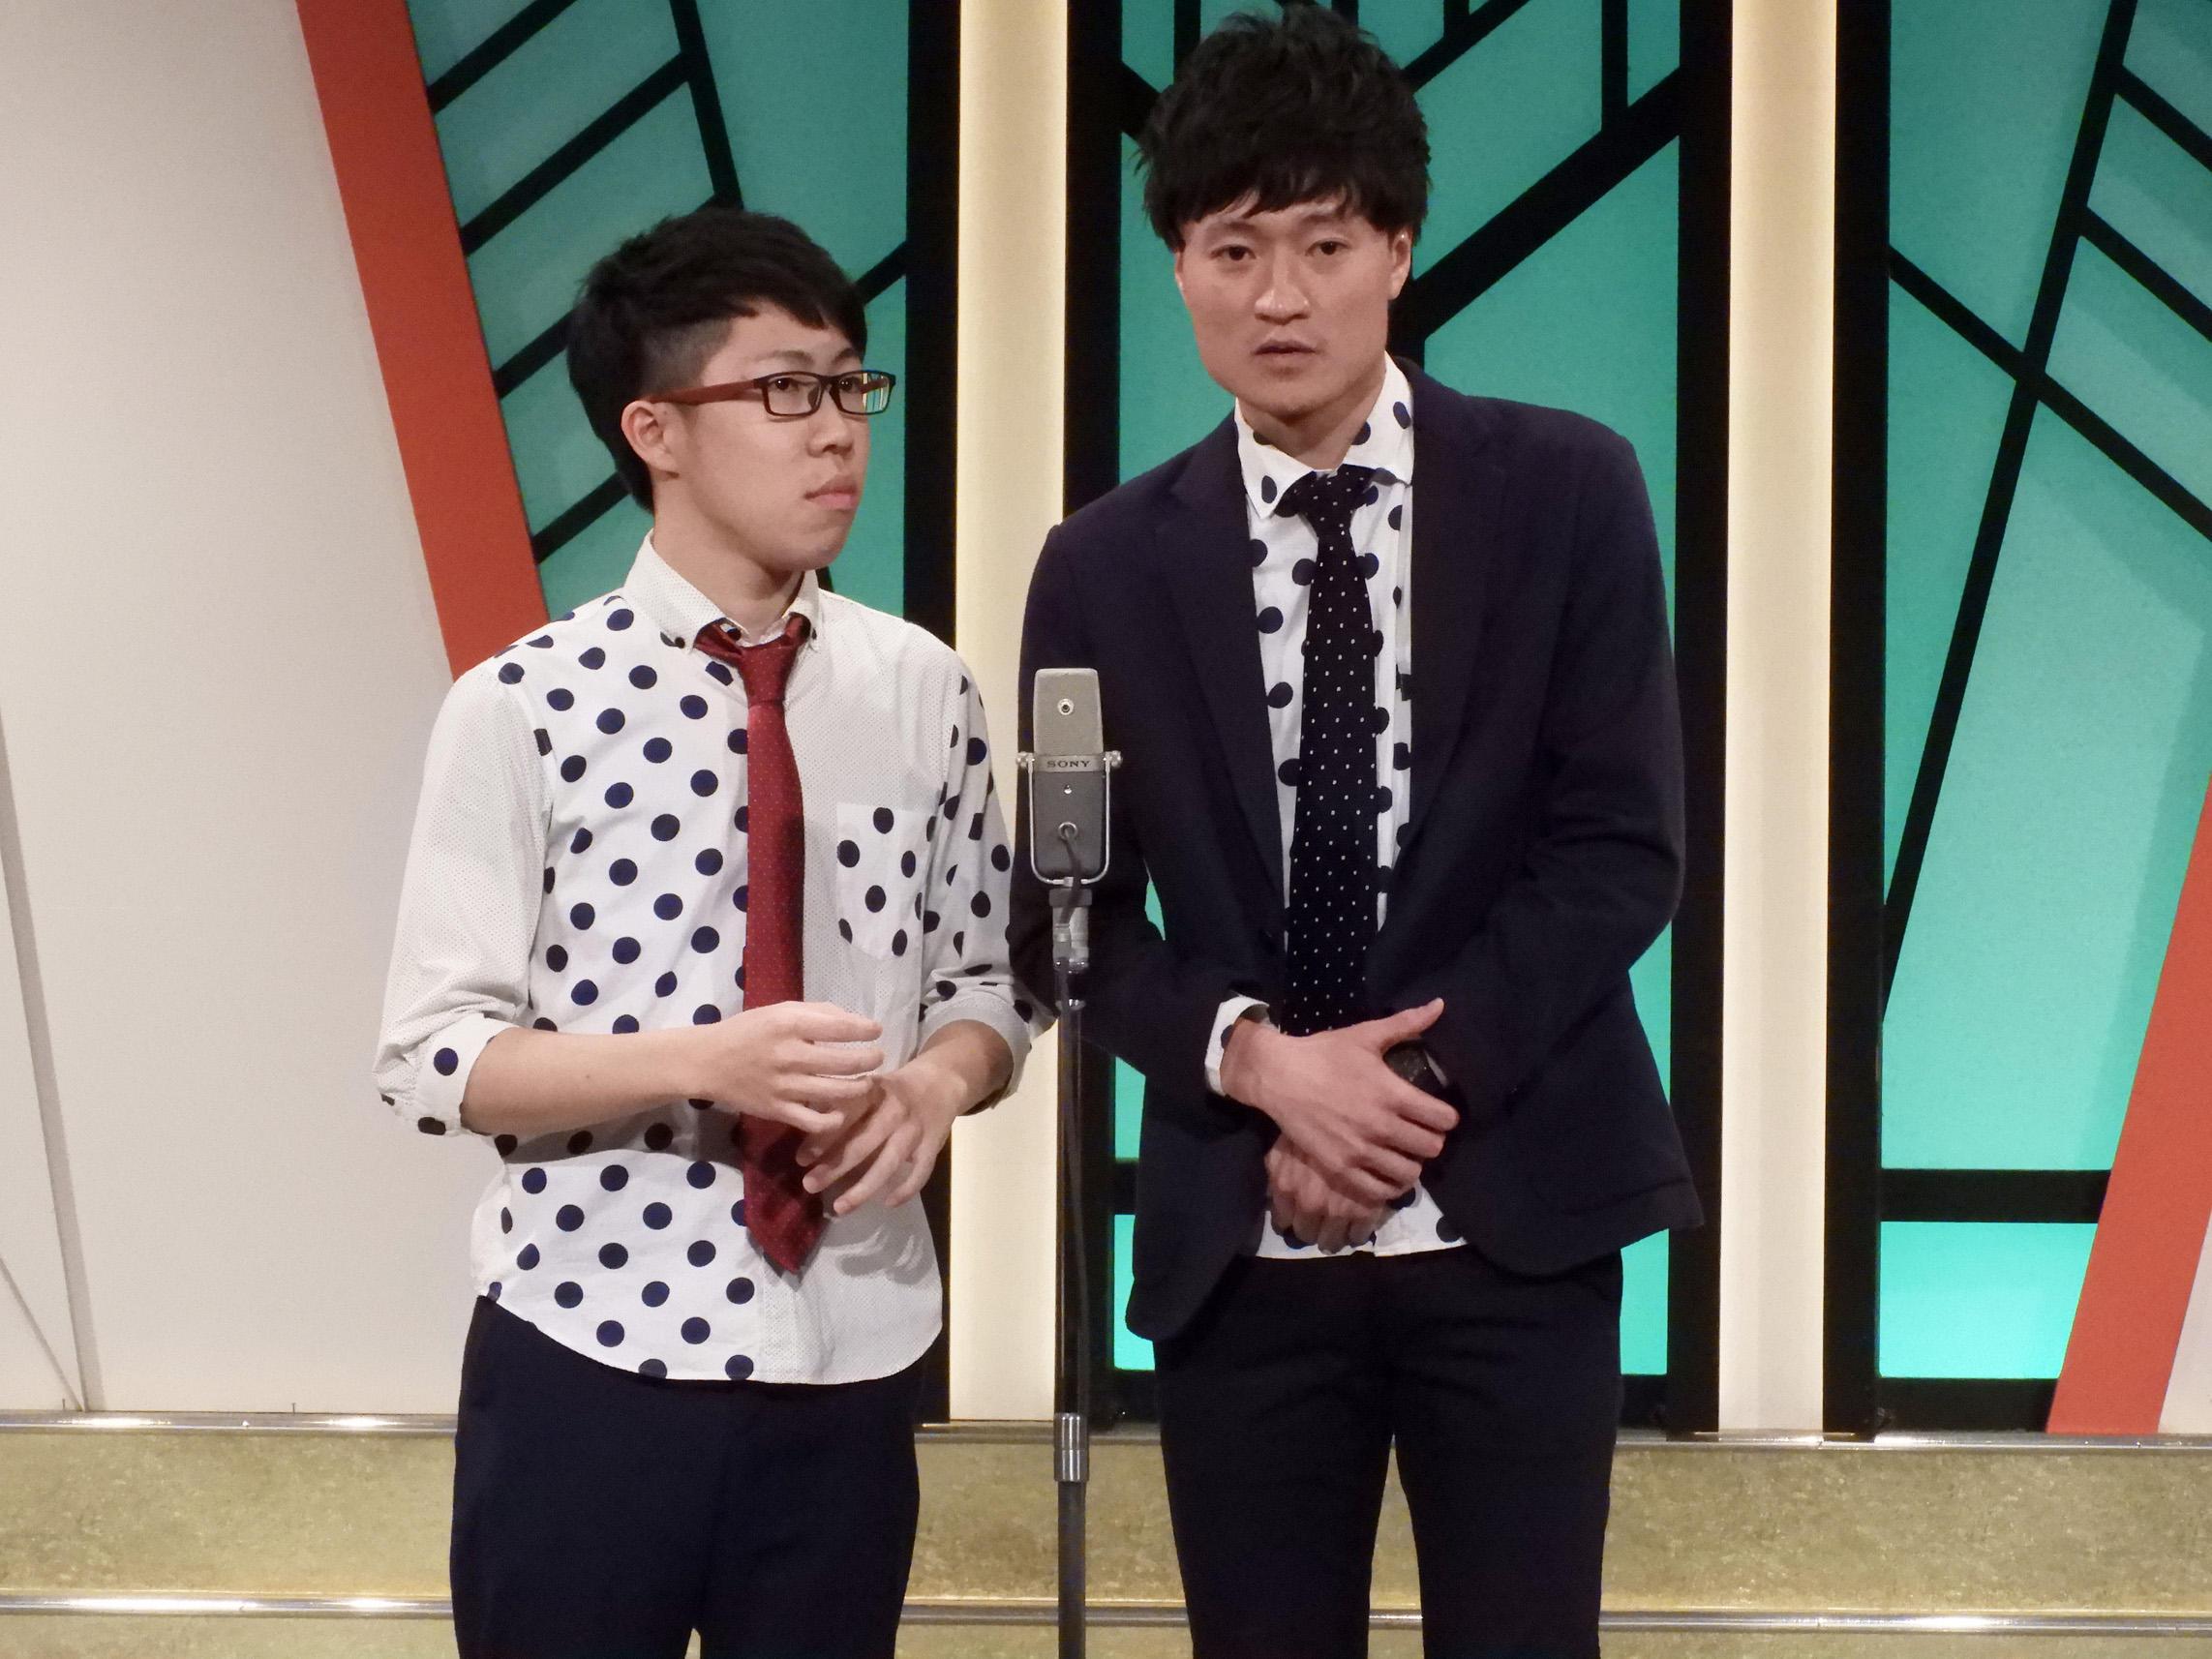 http://news.yoshimoto.co.jp/20181109120338-30b0a41c9fa473a9c784860ecaf9c9a7eee24a2a.jpg